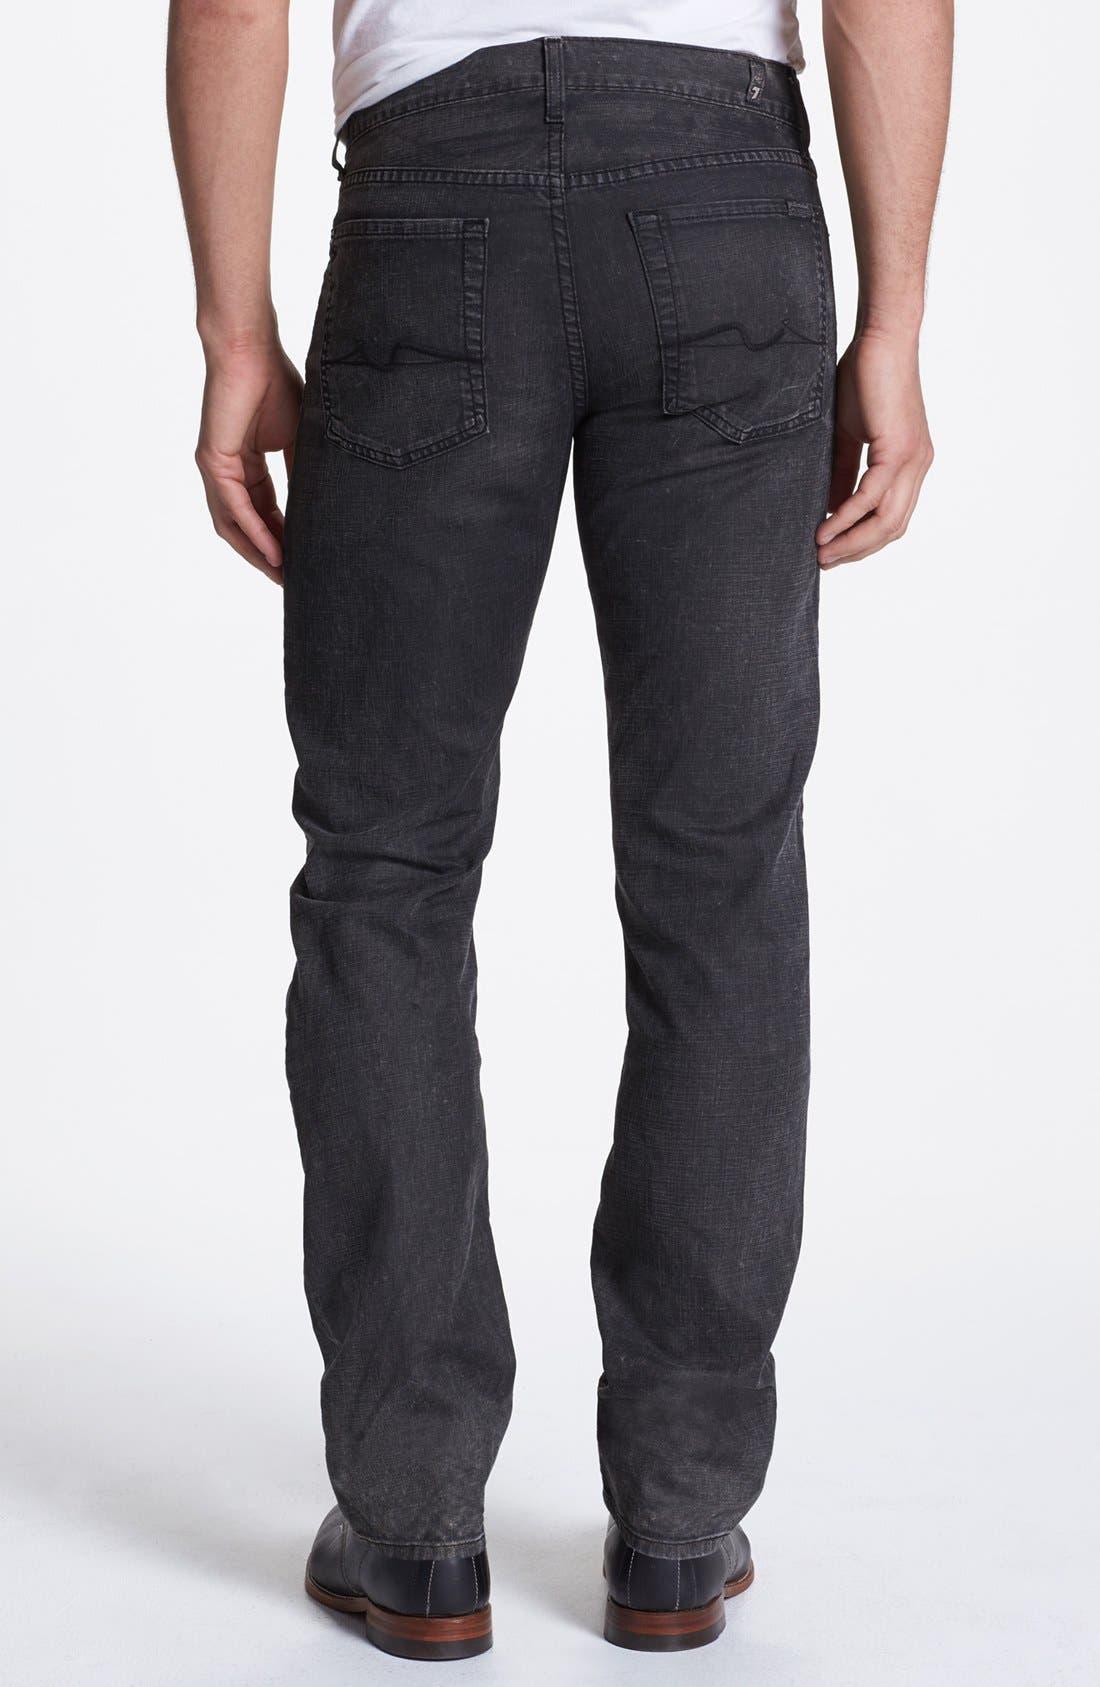 Alternate Image 1 Selected - 7 For All Mankind® 'Slimmy' Slim Fit Jeans (Seven Mile Lane)